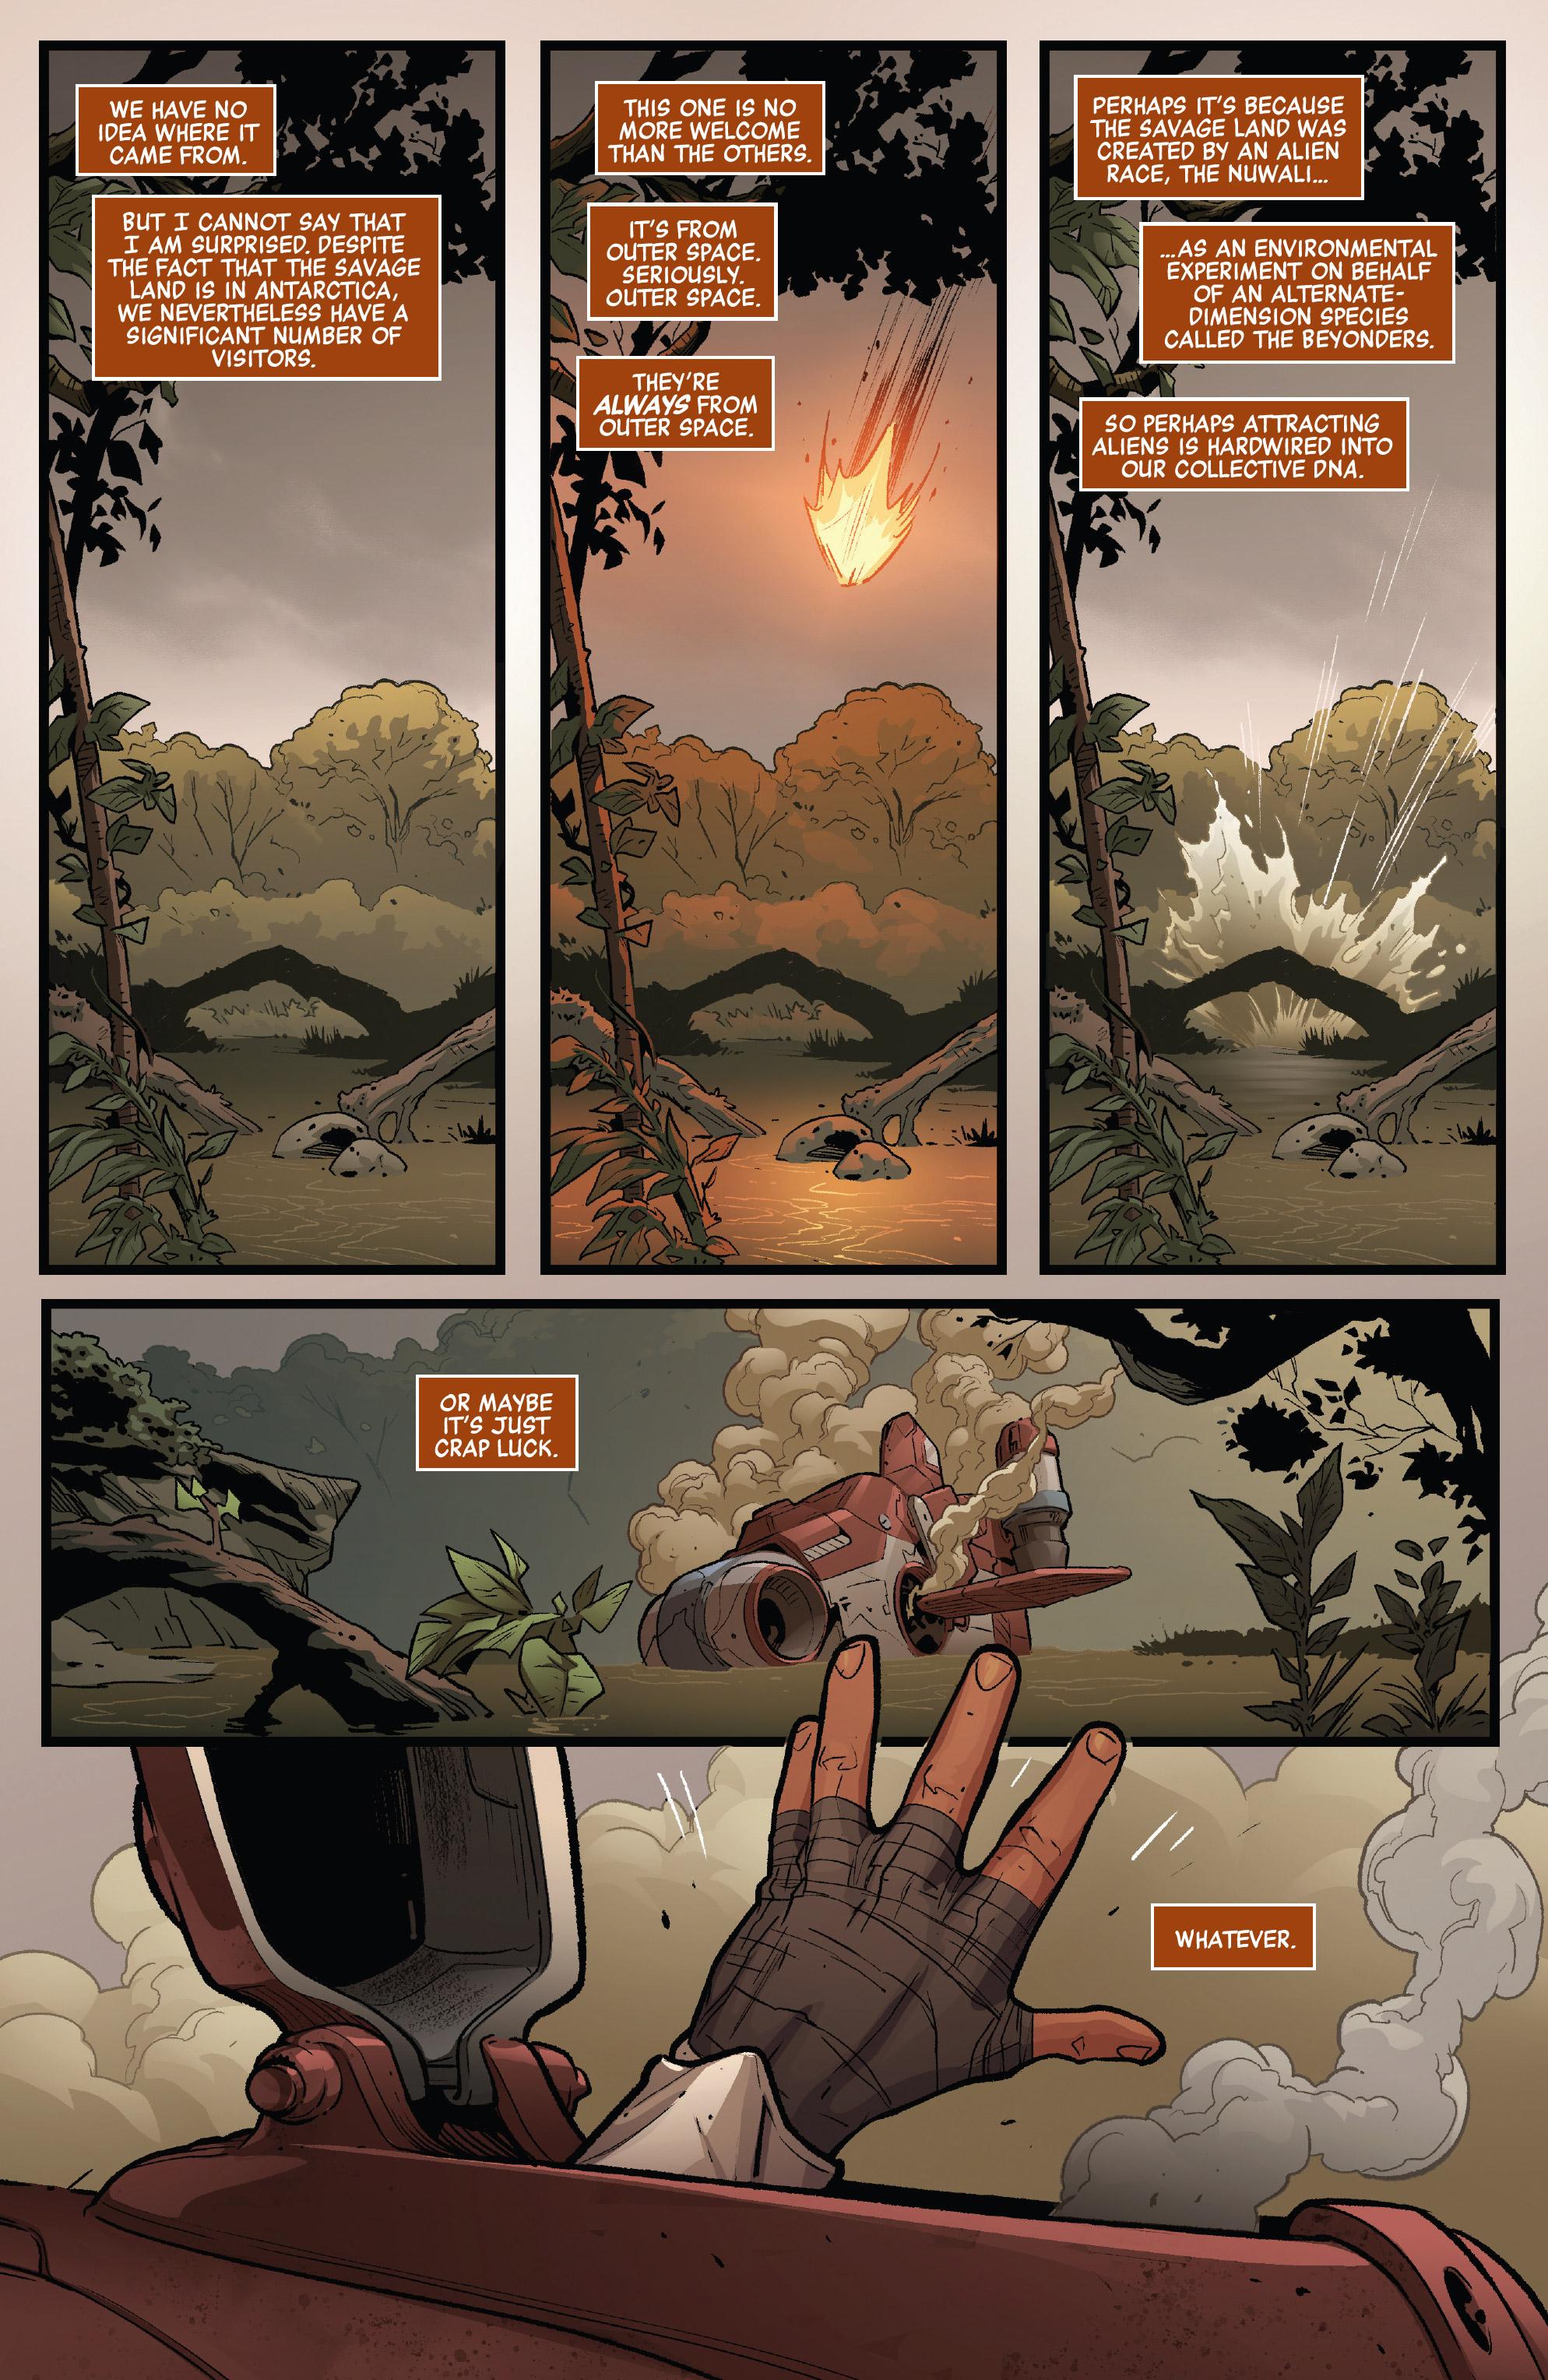 Fantastic Four - The Prodigal Sun 001-002.jpg